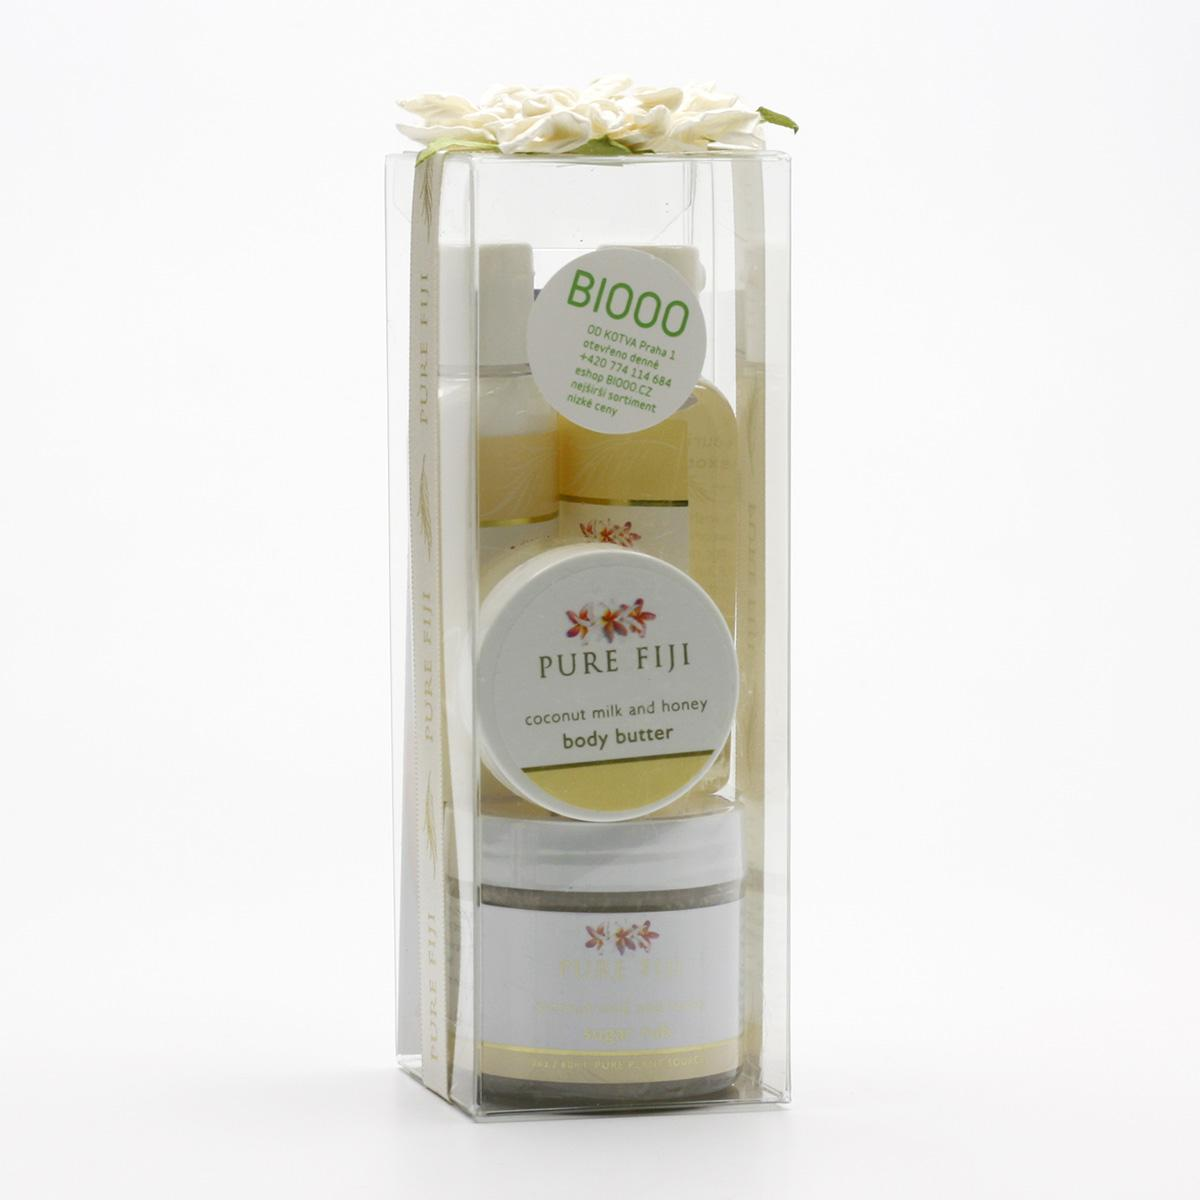 Pure Fiji Dárková sada kokosových produktů, mléko & med 4 ks